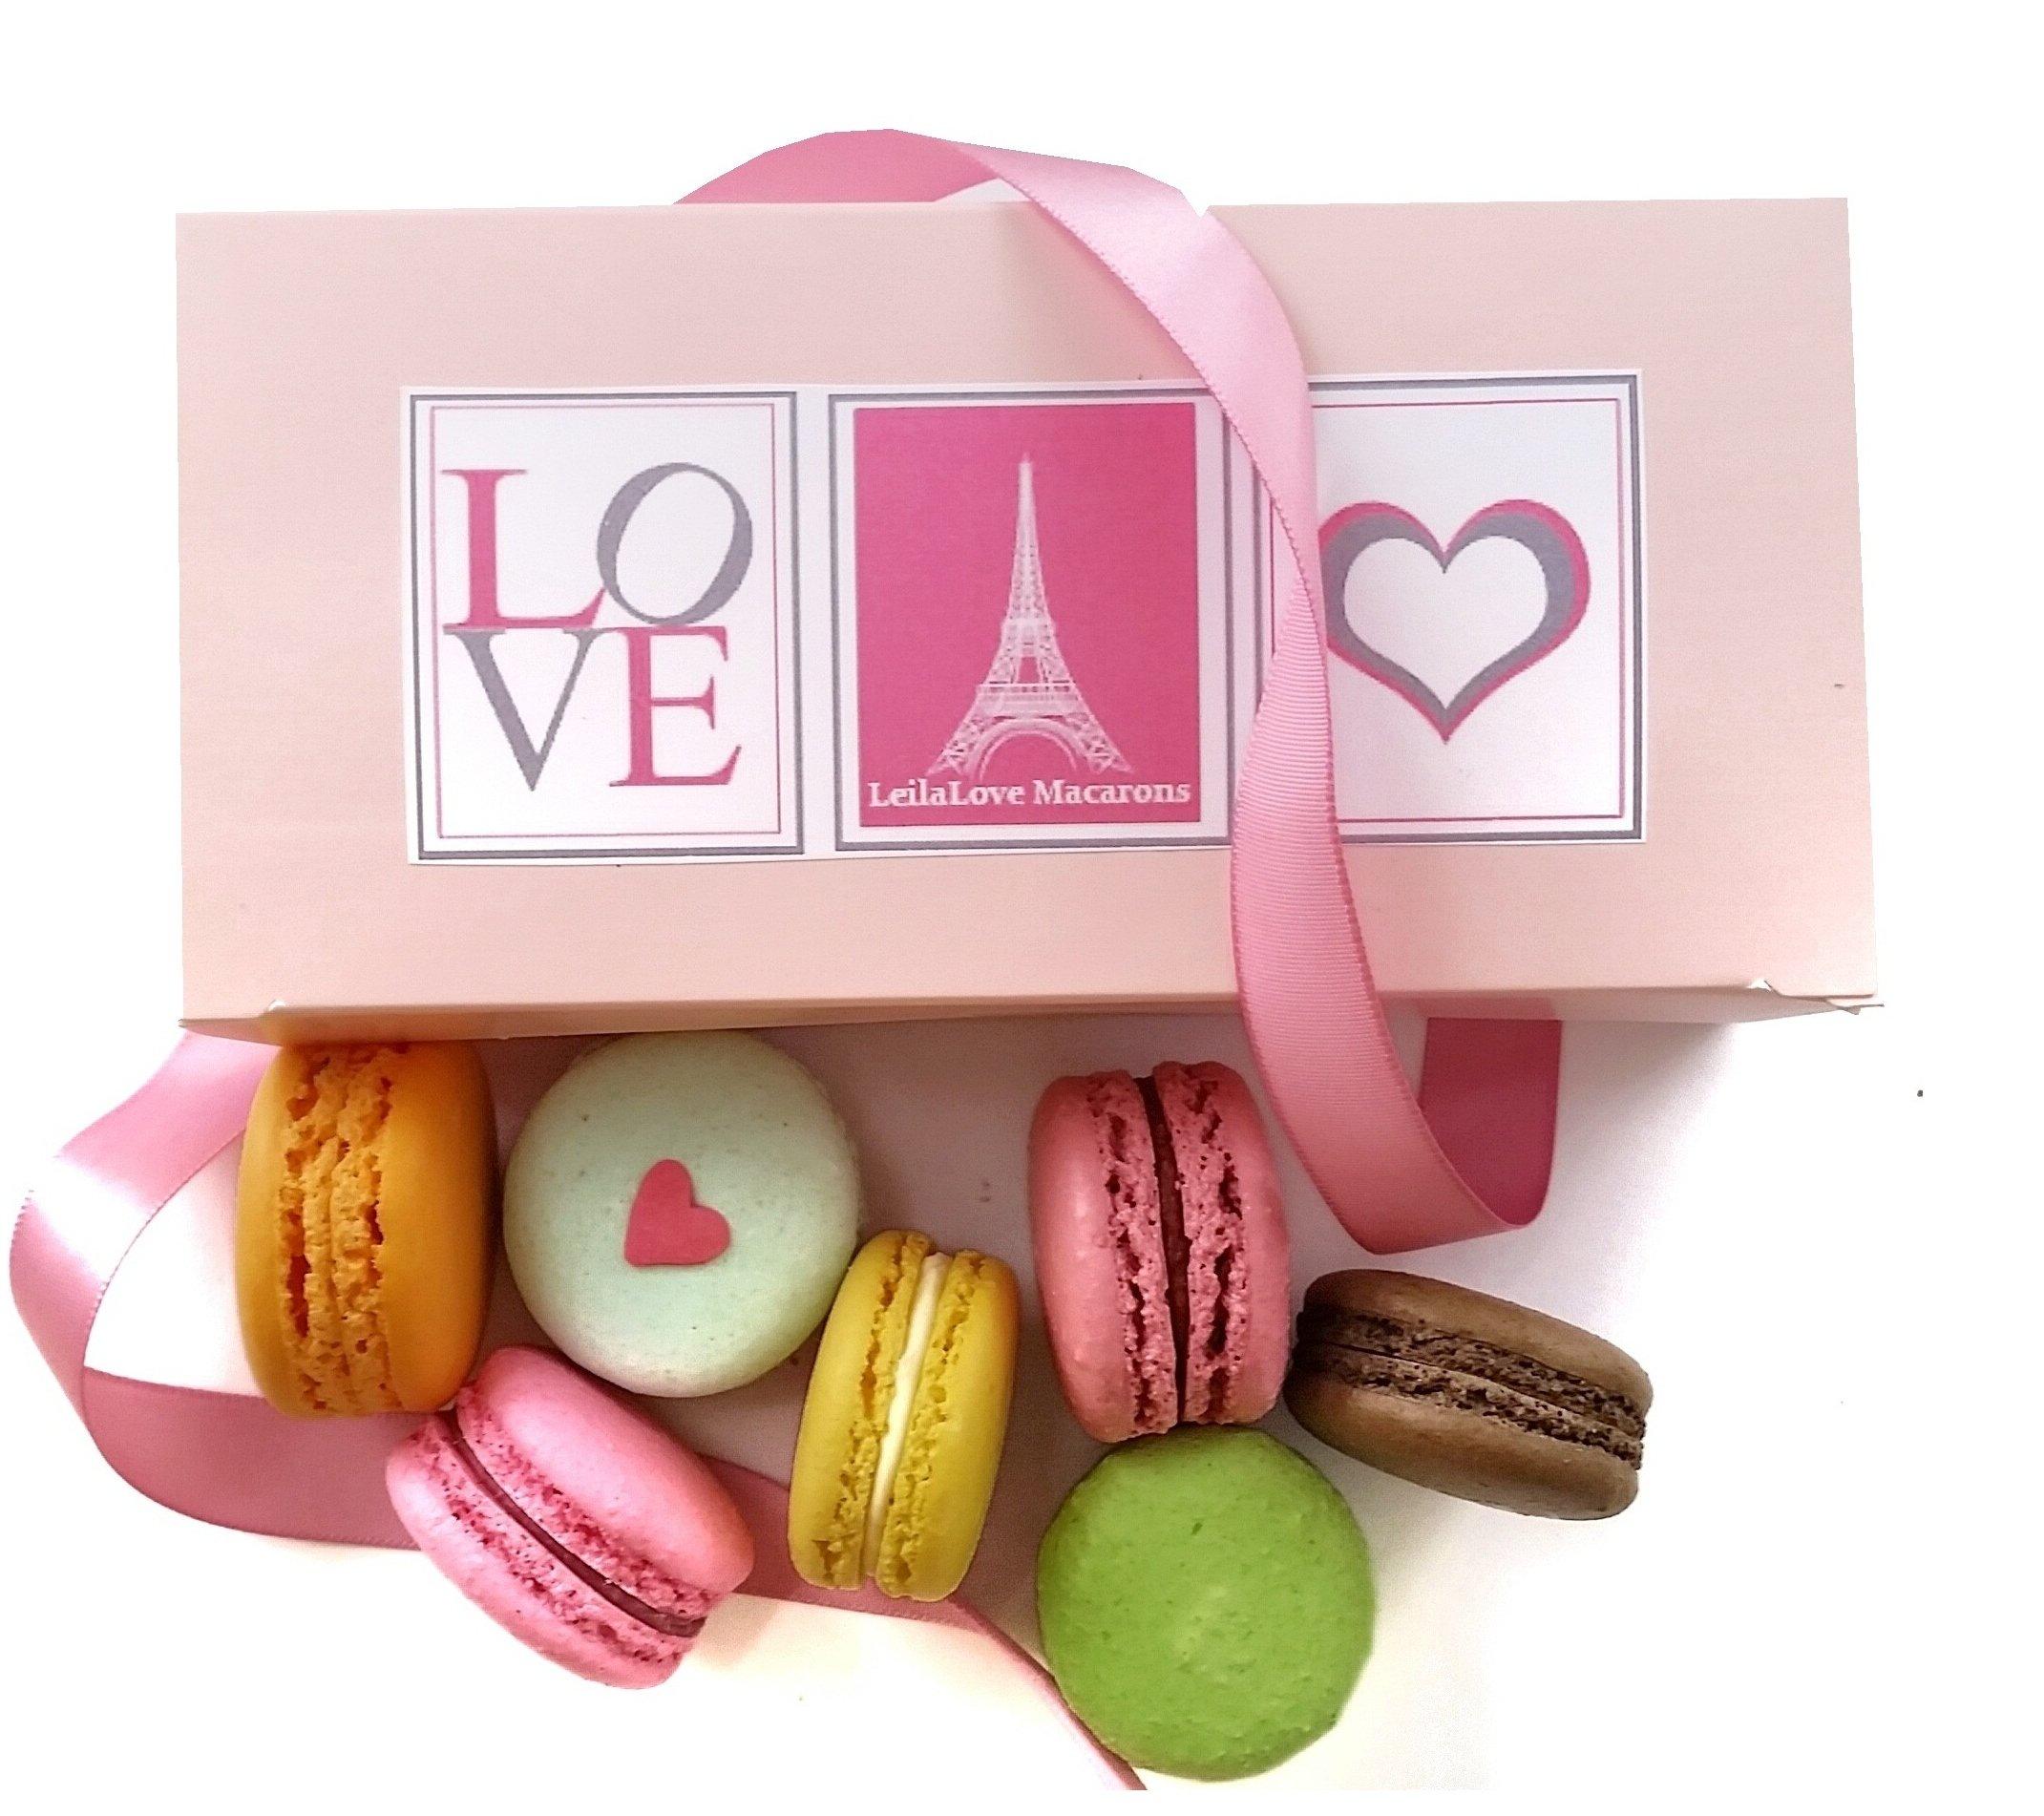 French Gourmet Macarons Love in Paris Gift box of 8 fresh almond Macarons